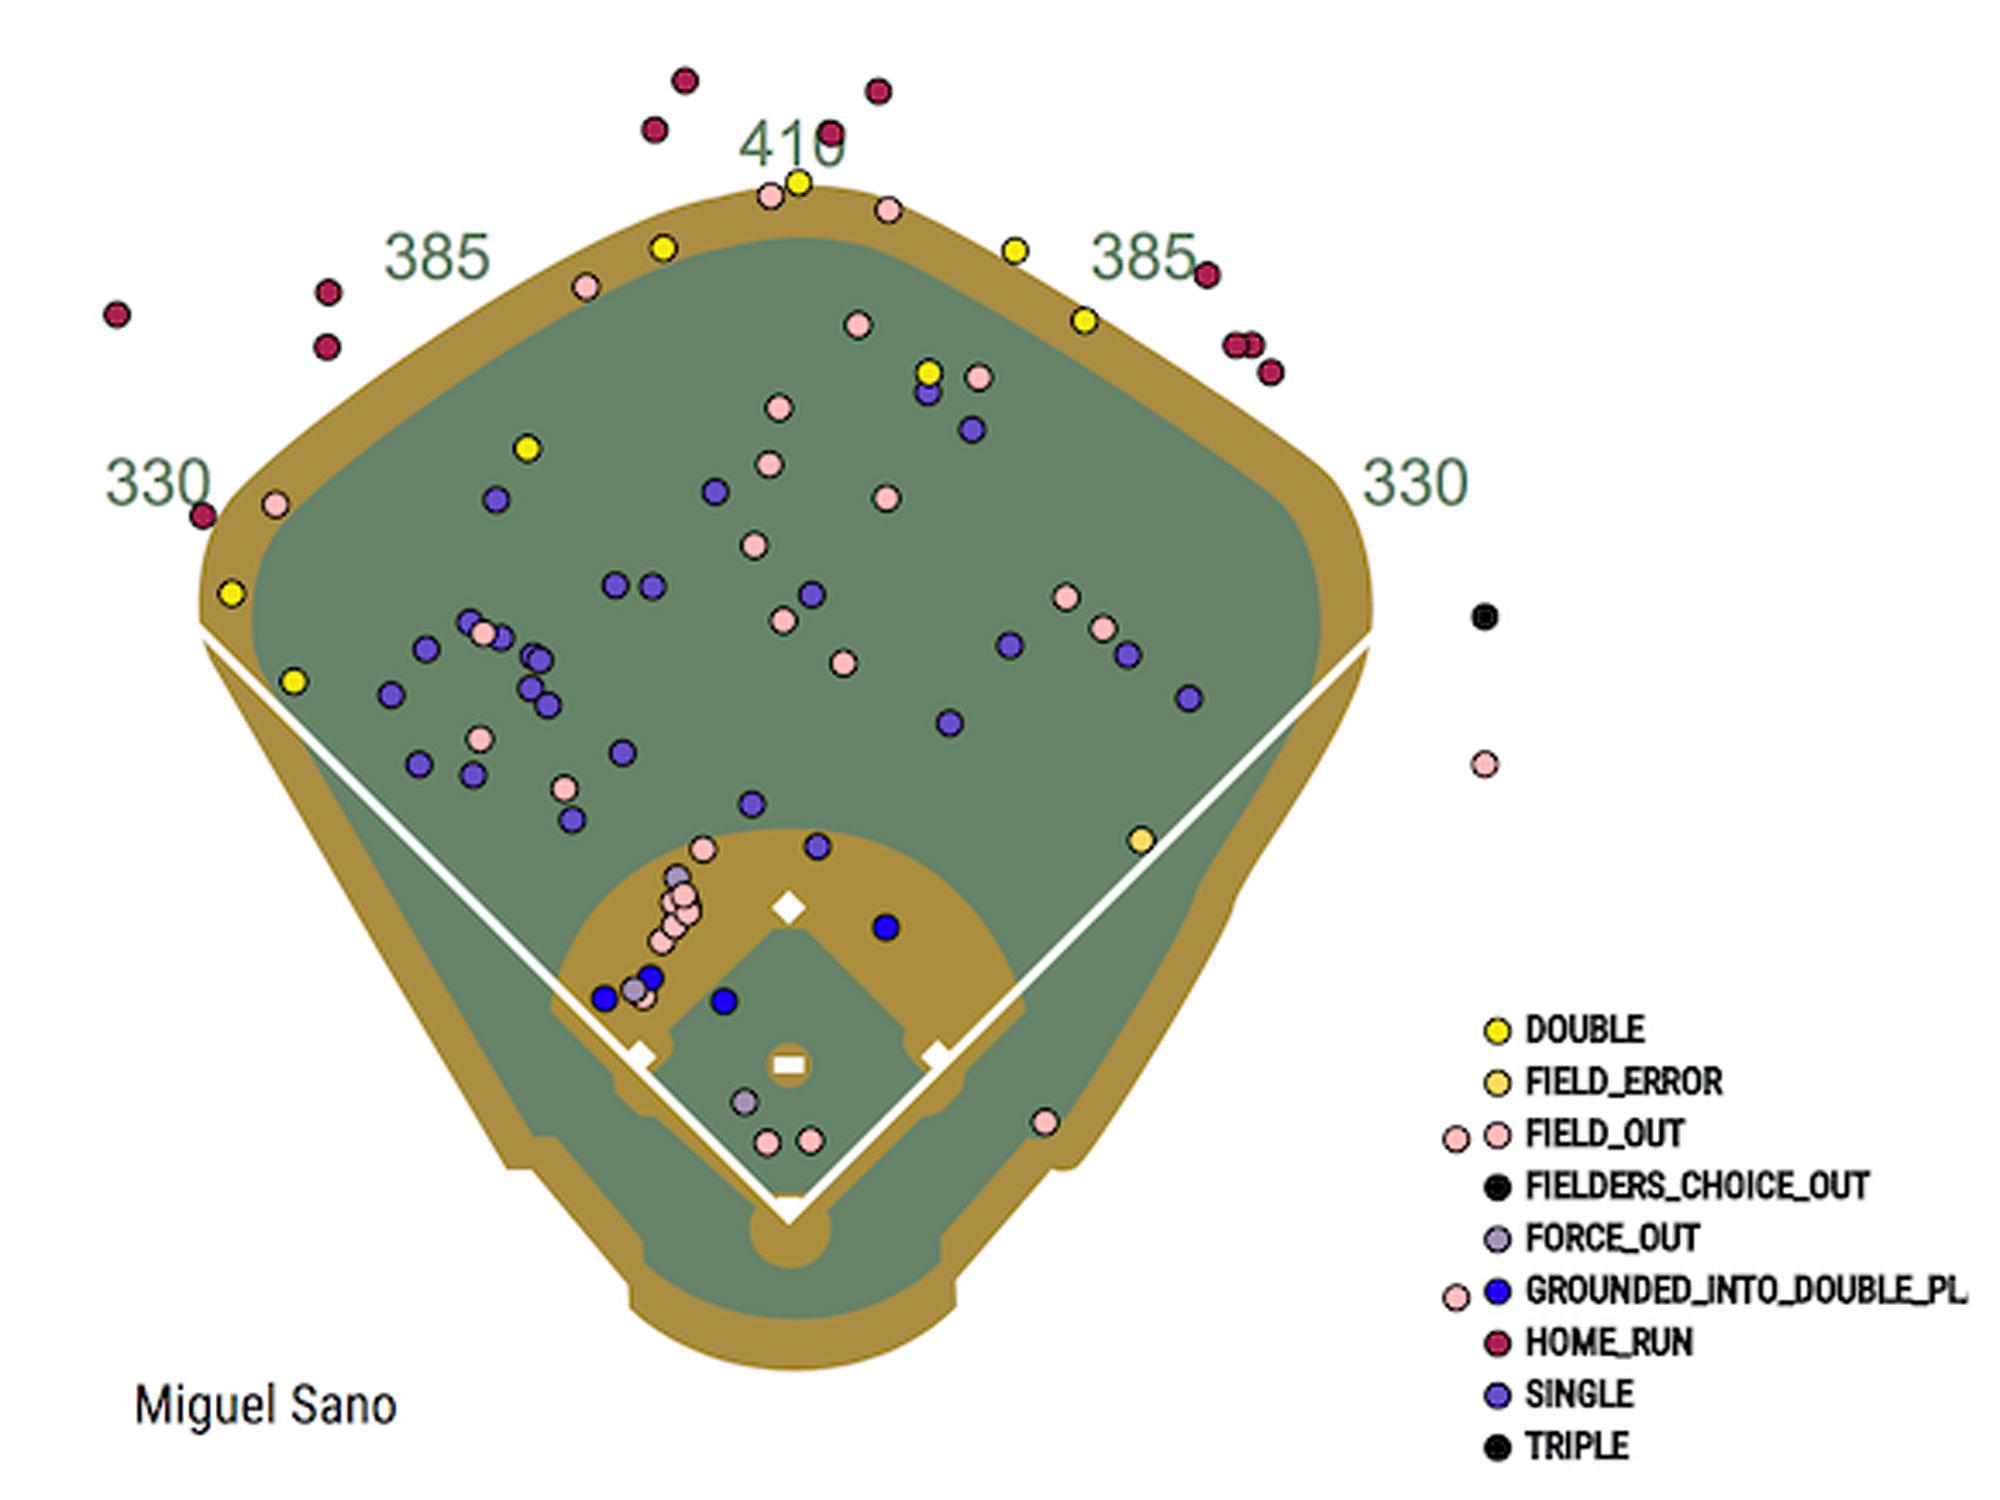 Miguel Sano, Minnesota Twins